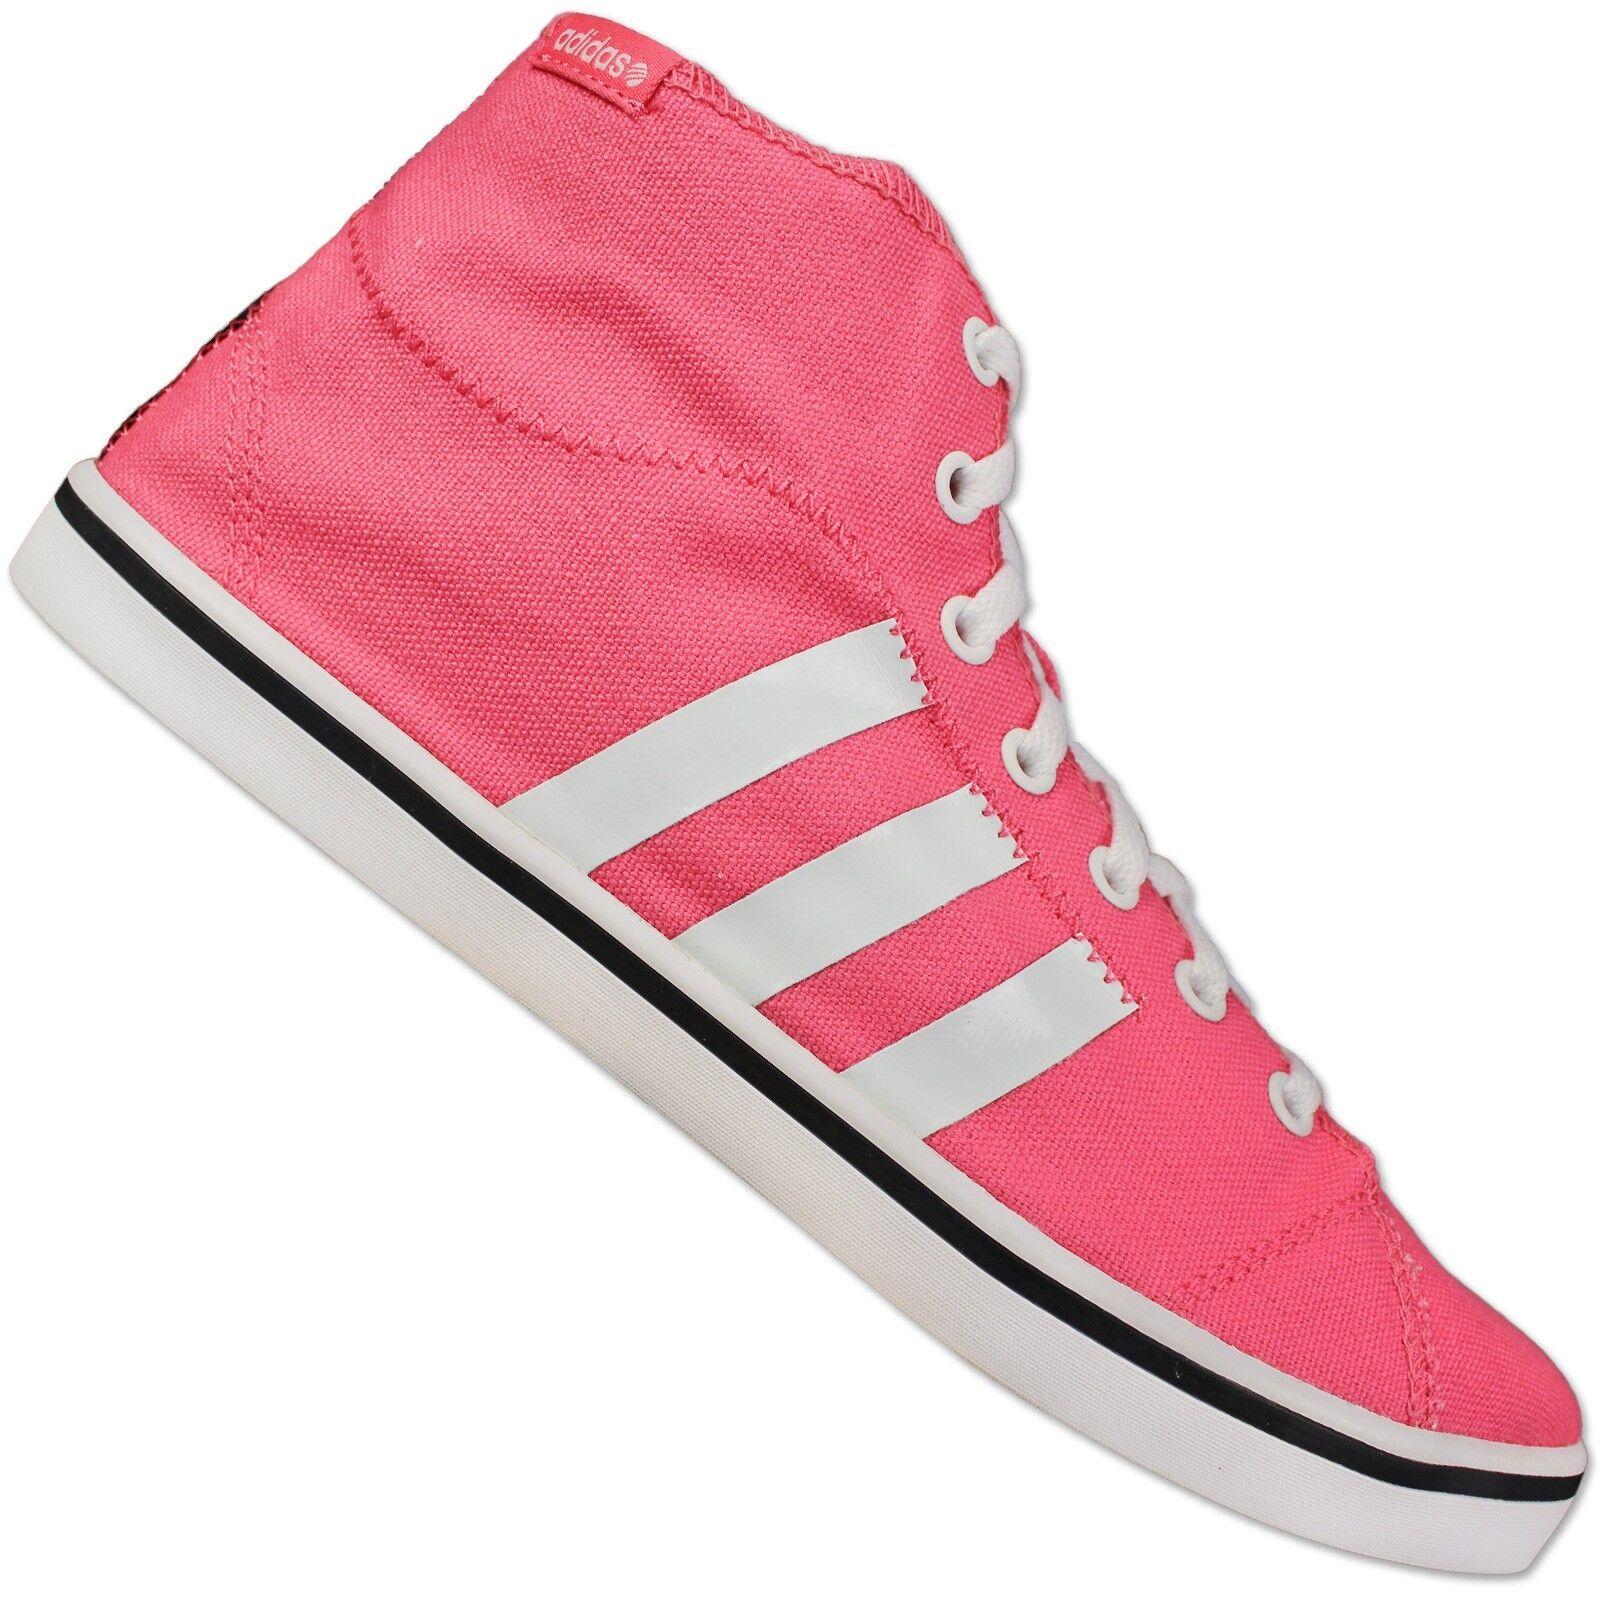 Adidas Neo Toile Vlneo Bball Femmes mi Baskets Montantes Rose Chaussures D' Été